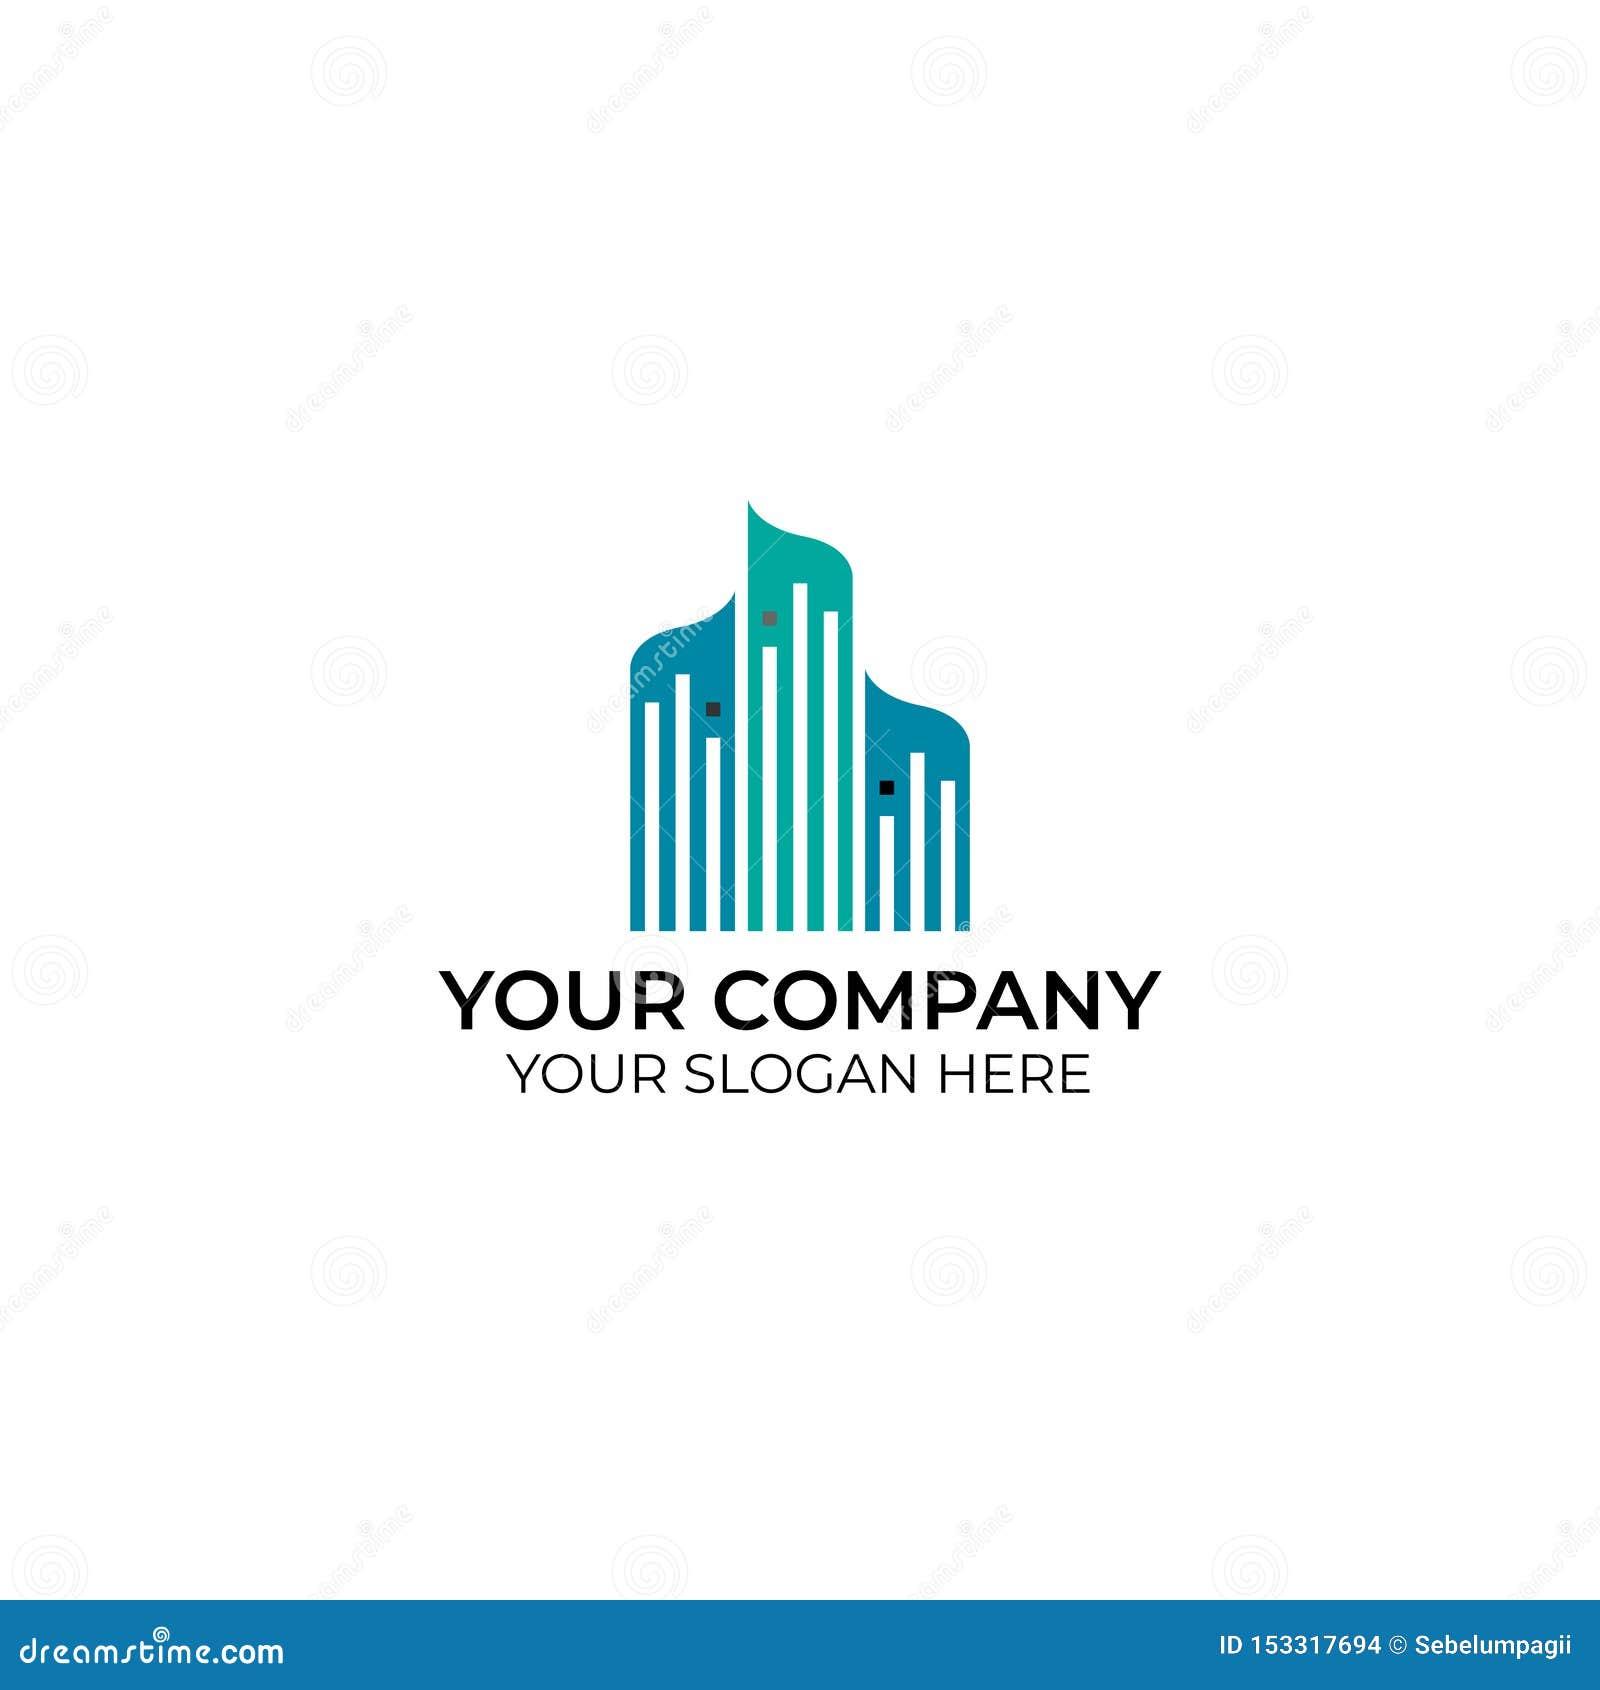 Cityscape business logo